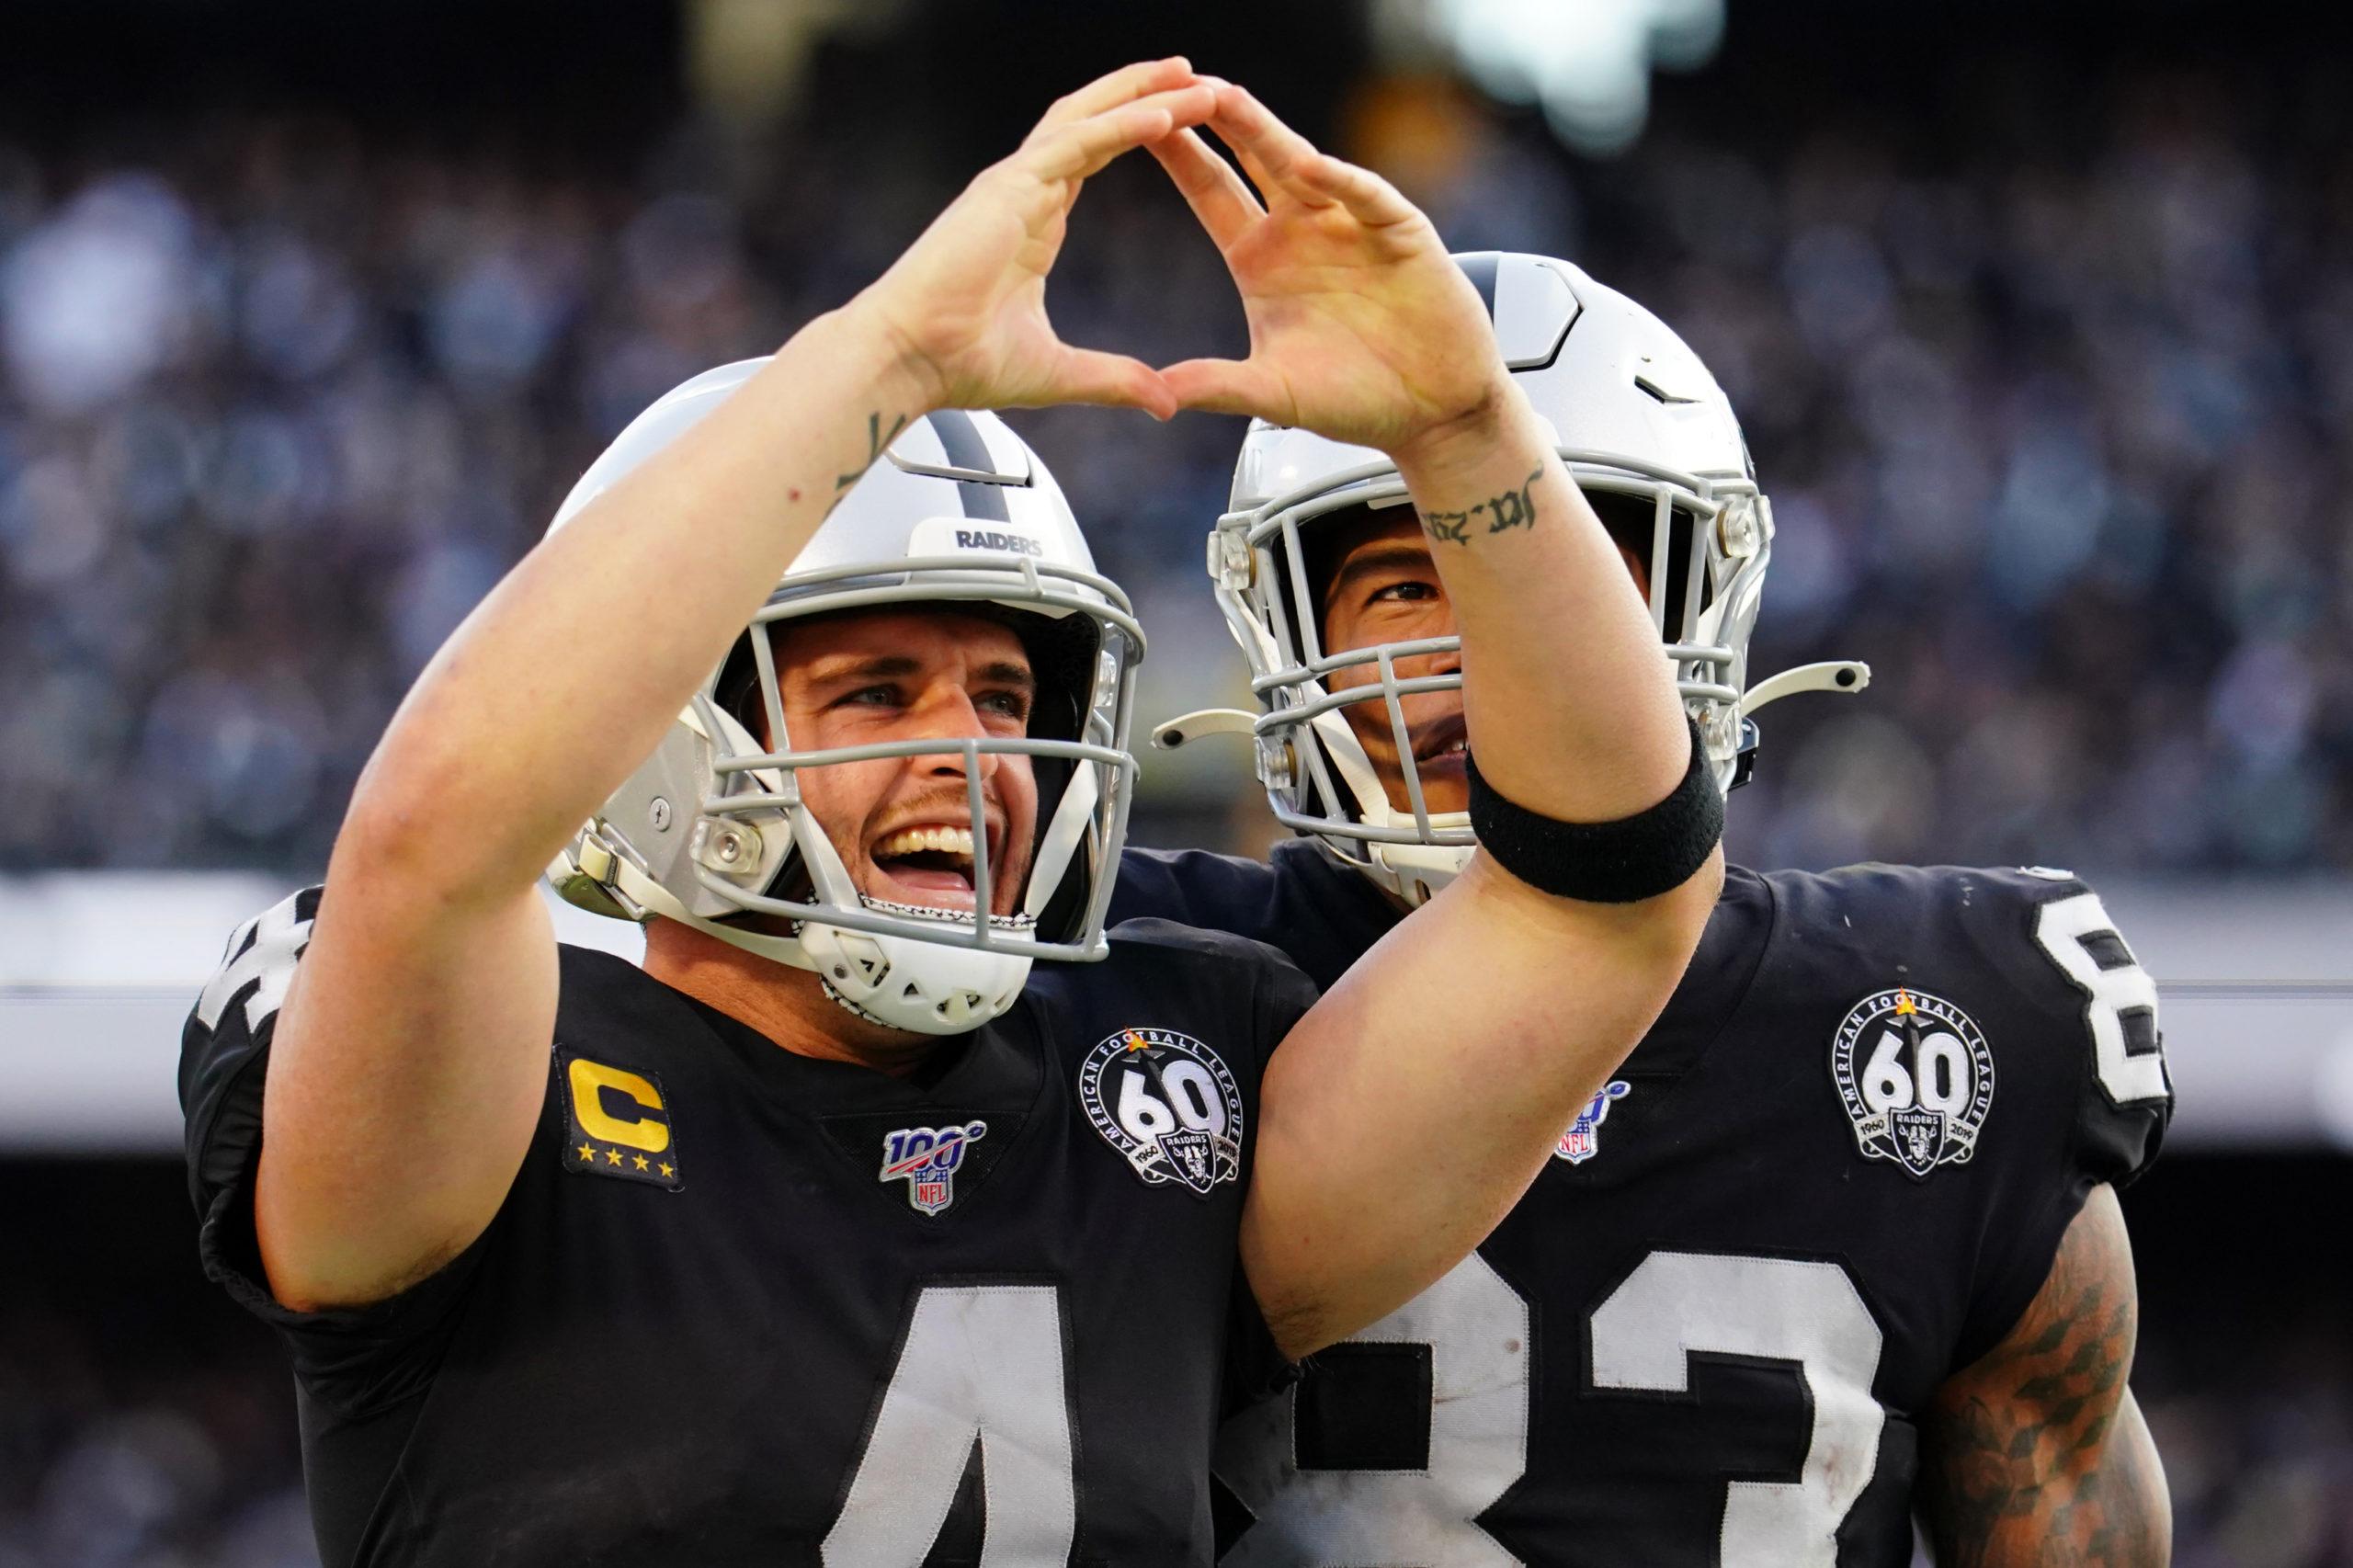 Super Bowl Odds week 3 - Raiders Improve